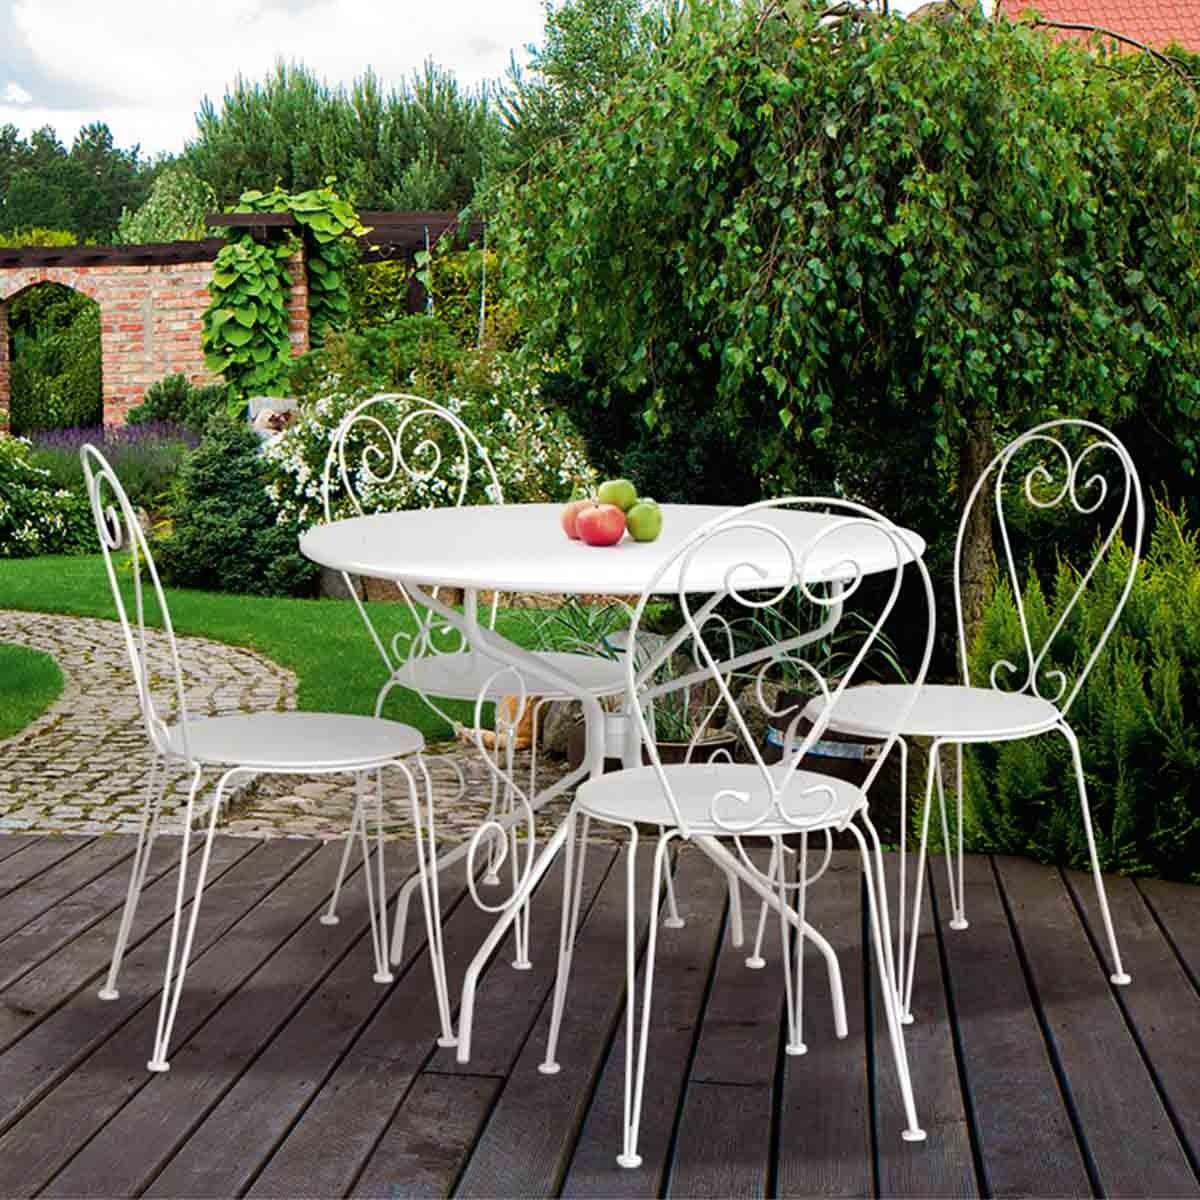 Salon de jardin table ronde blanche Mailleraye jardin